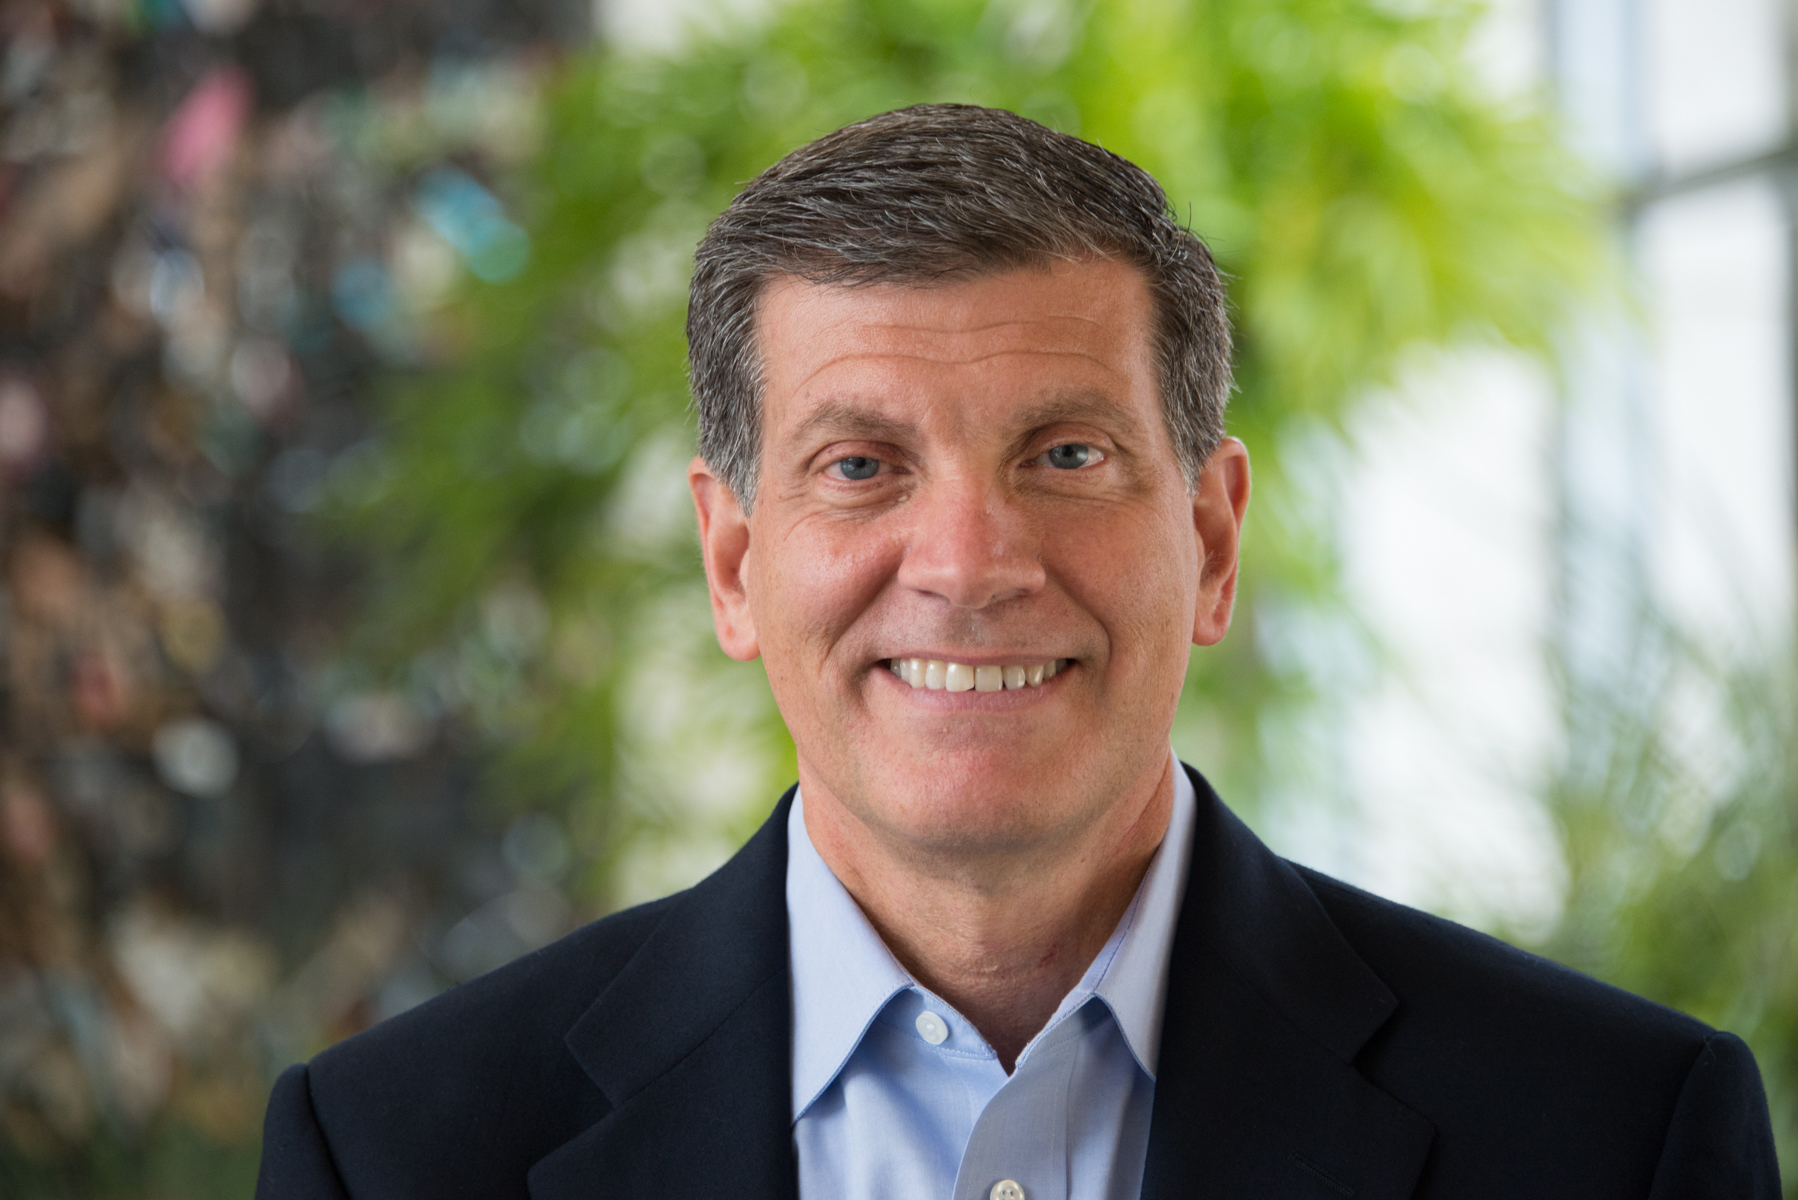 Frank Calderoni, CEO of Anaplan